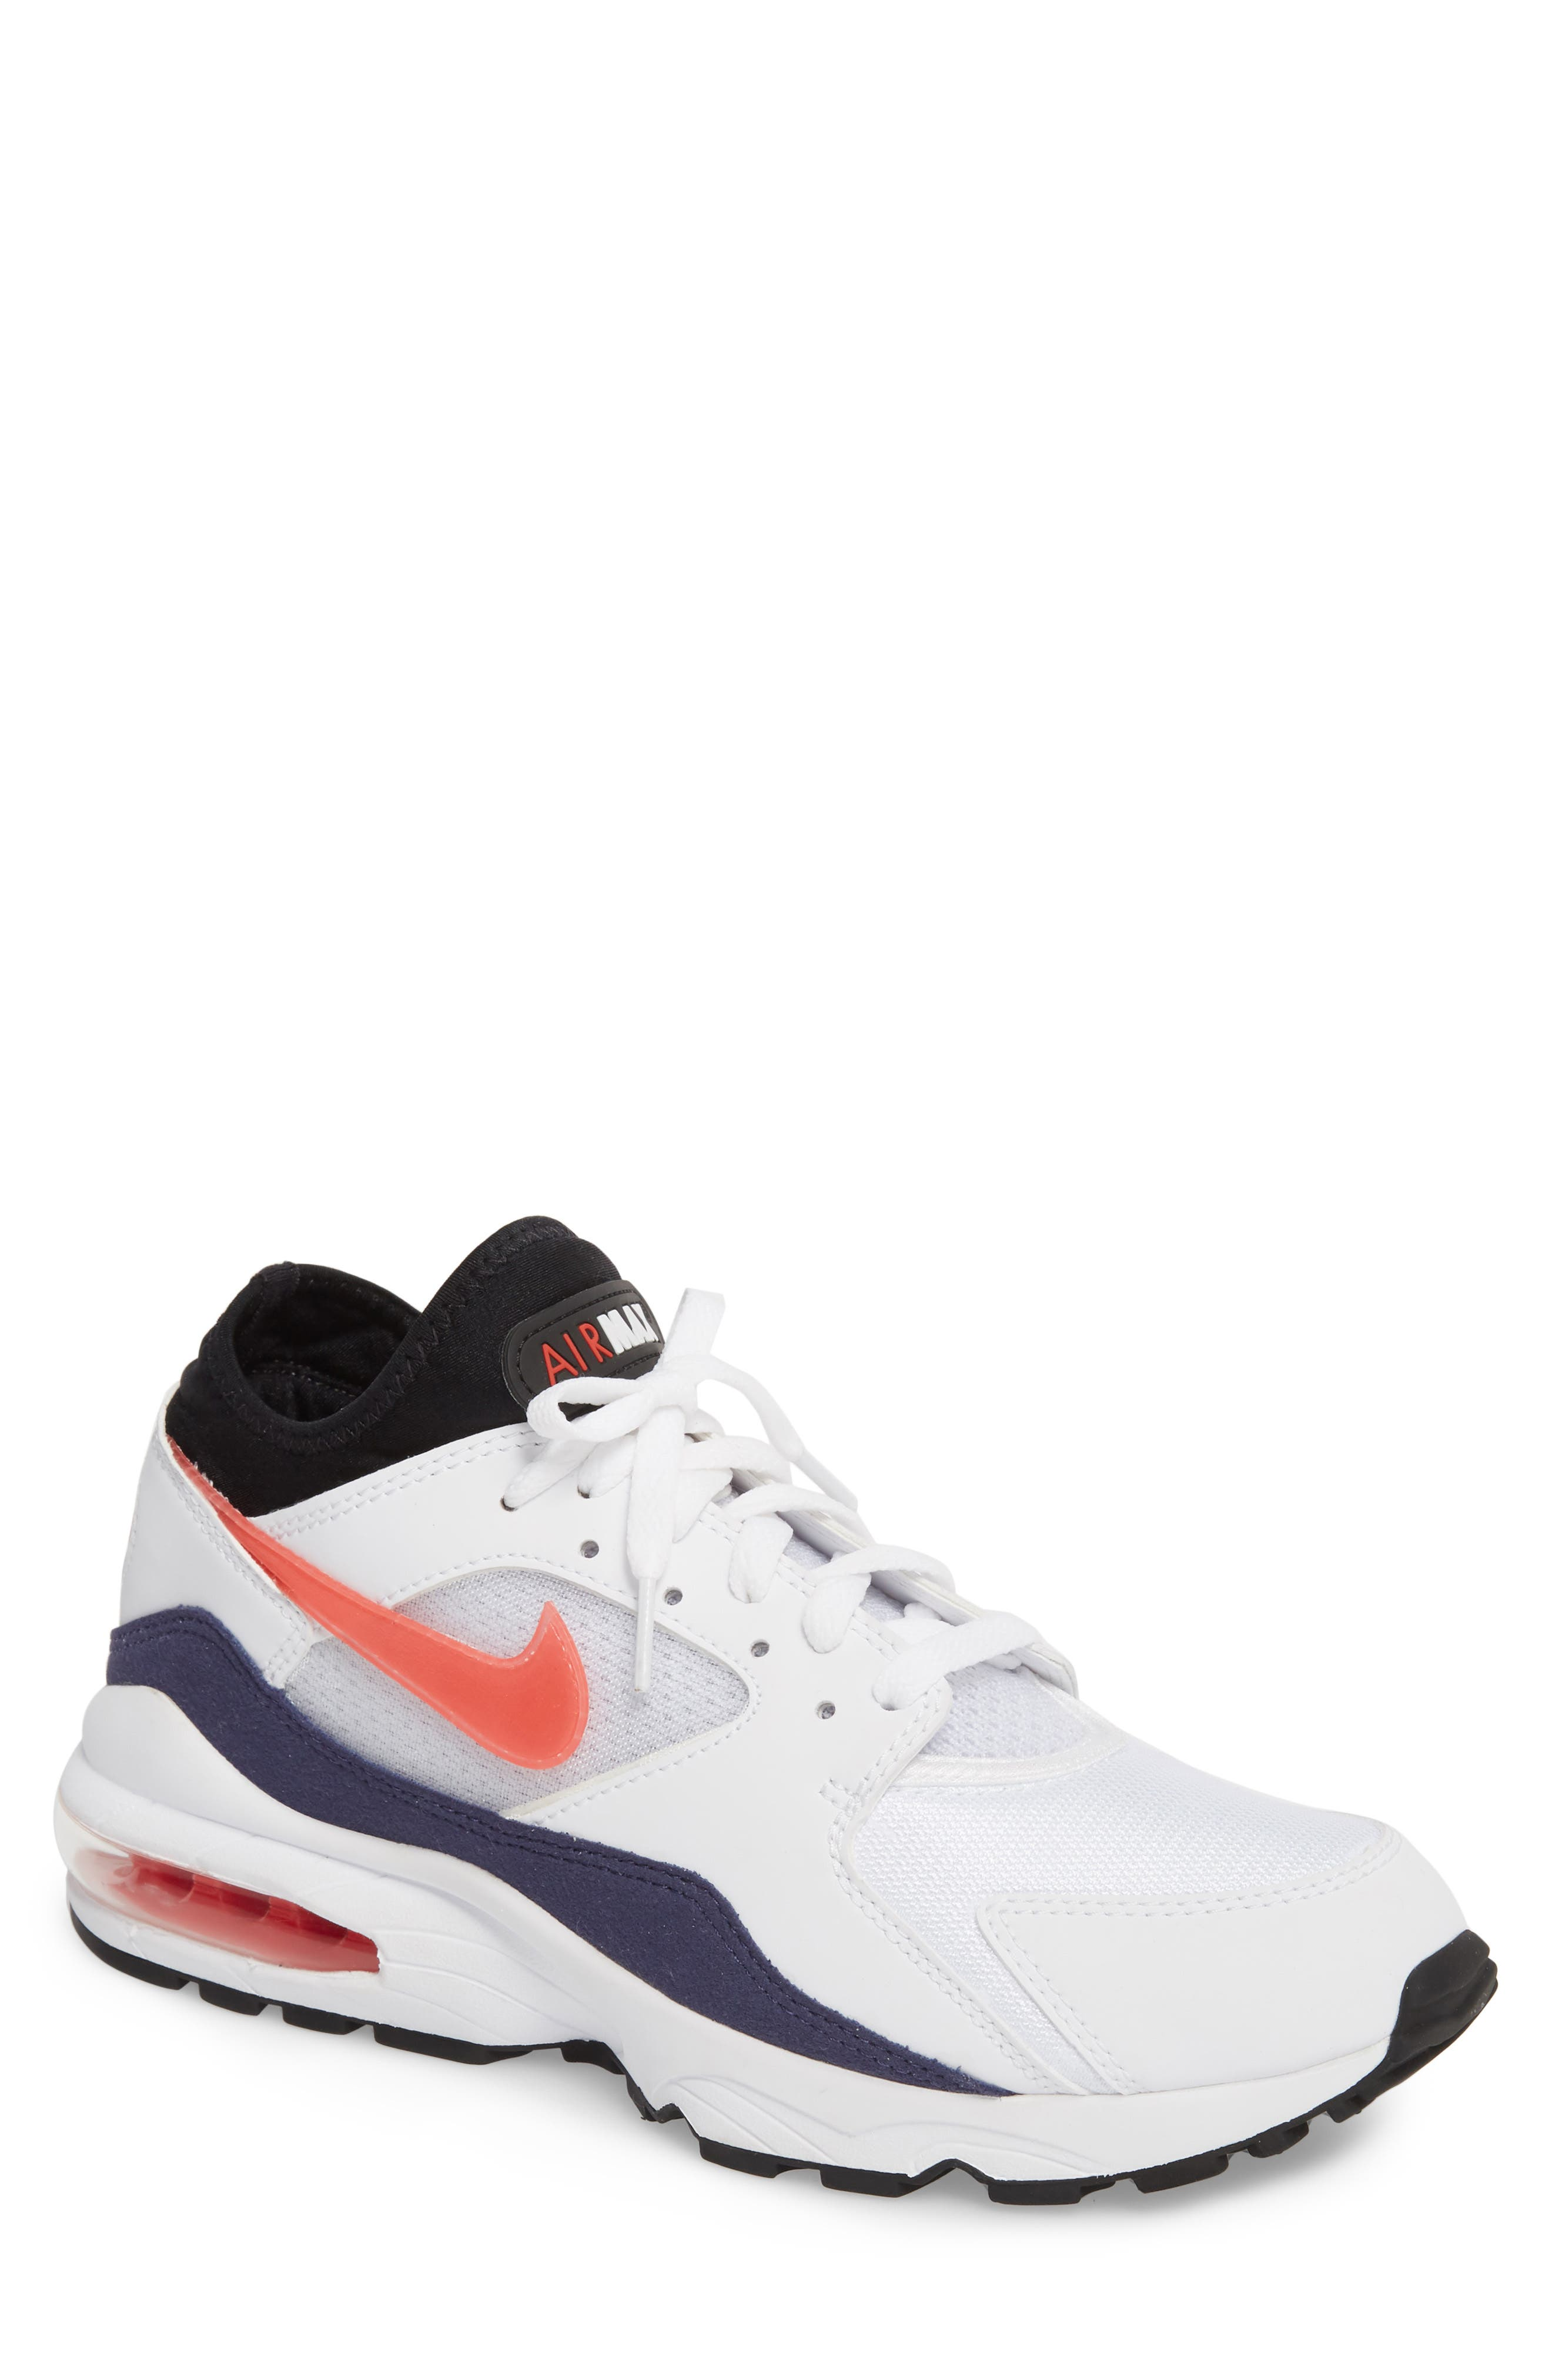 NIKE,                             Air Max 93 Sneaker,                             Main thumbnail 1, color,                             102